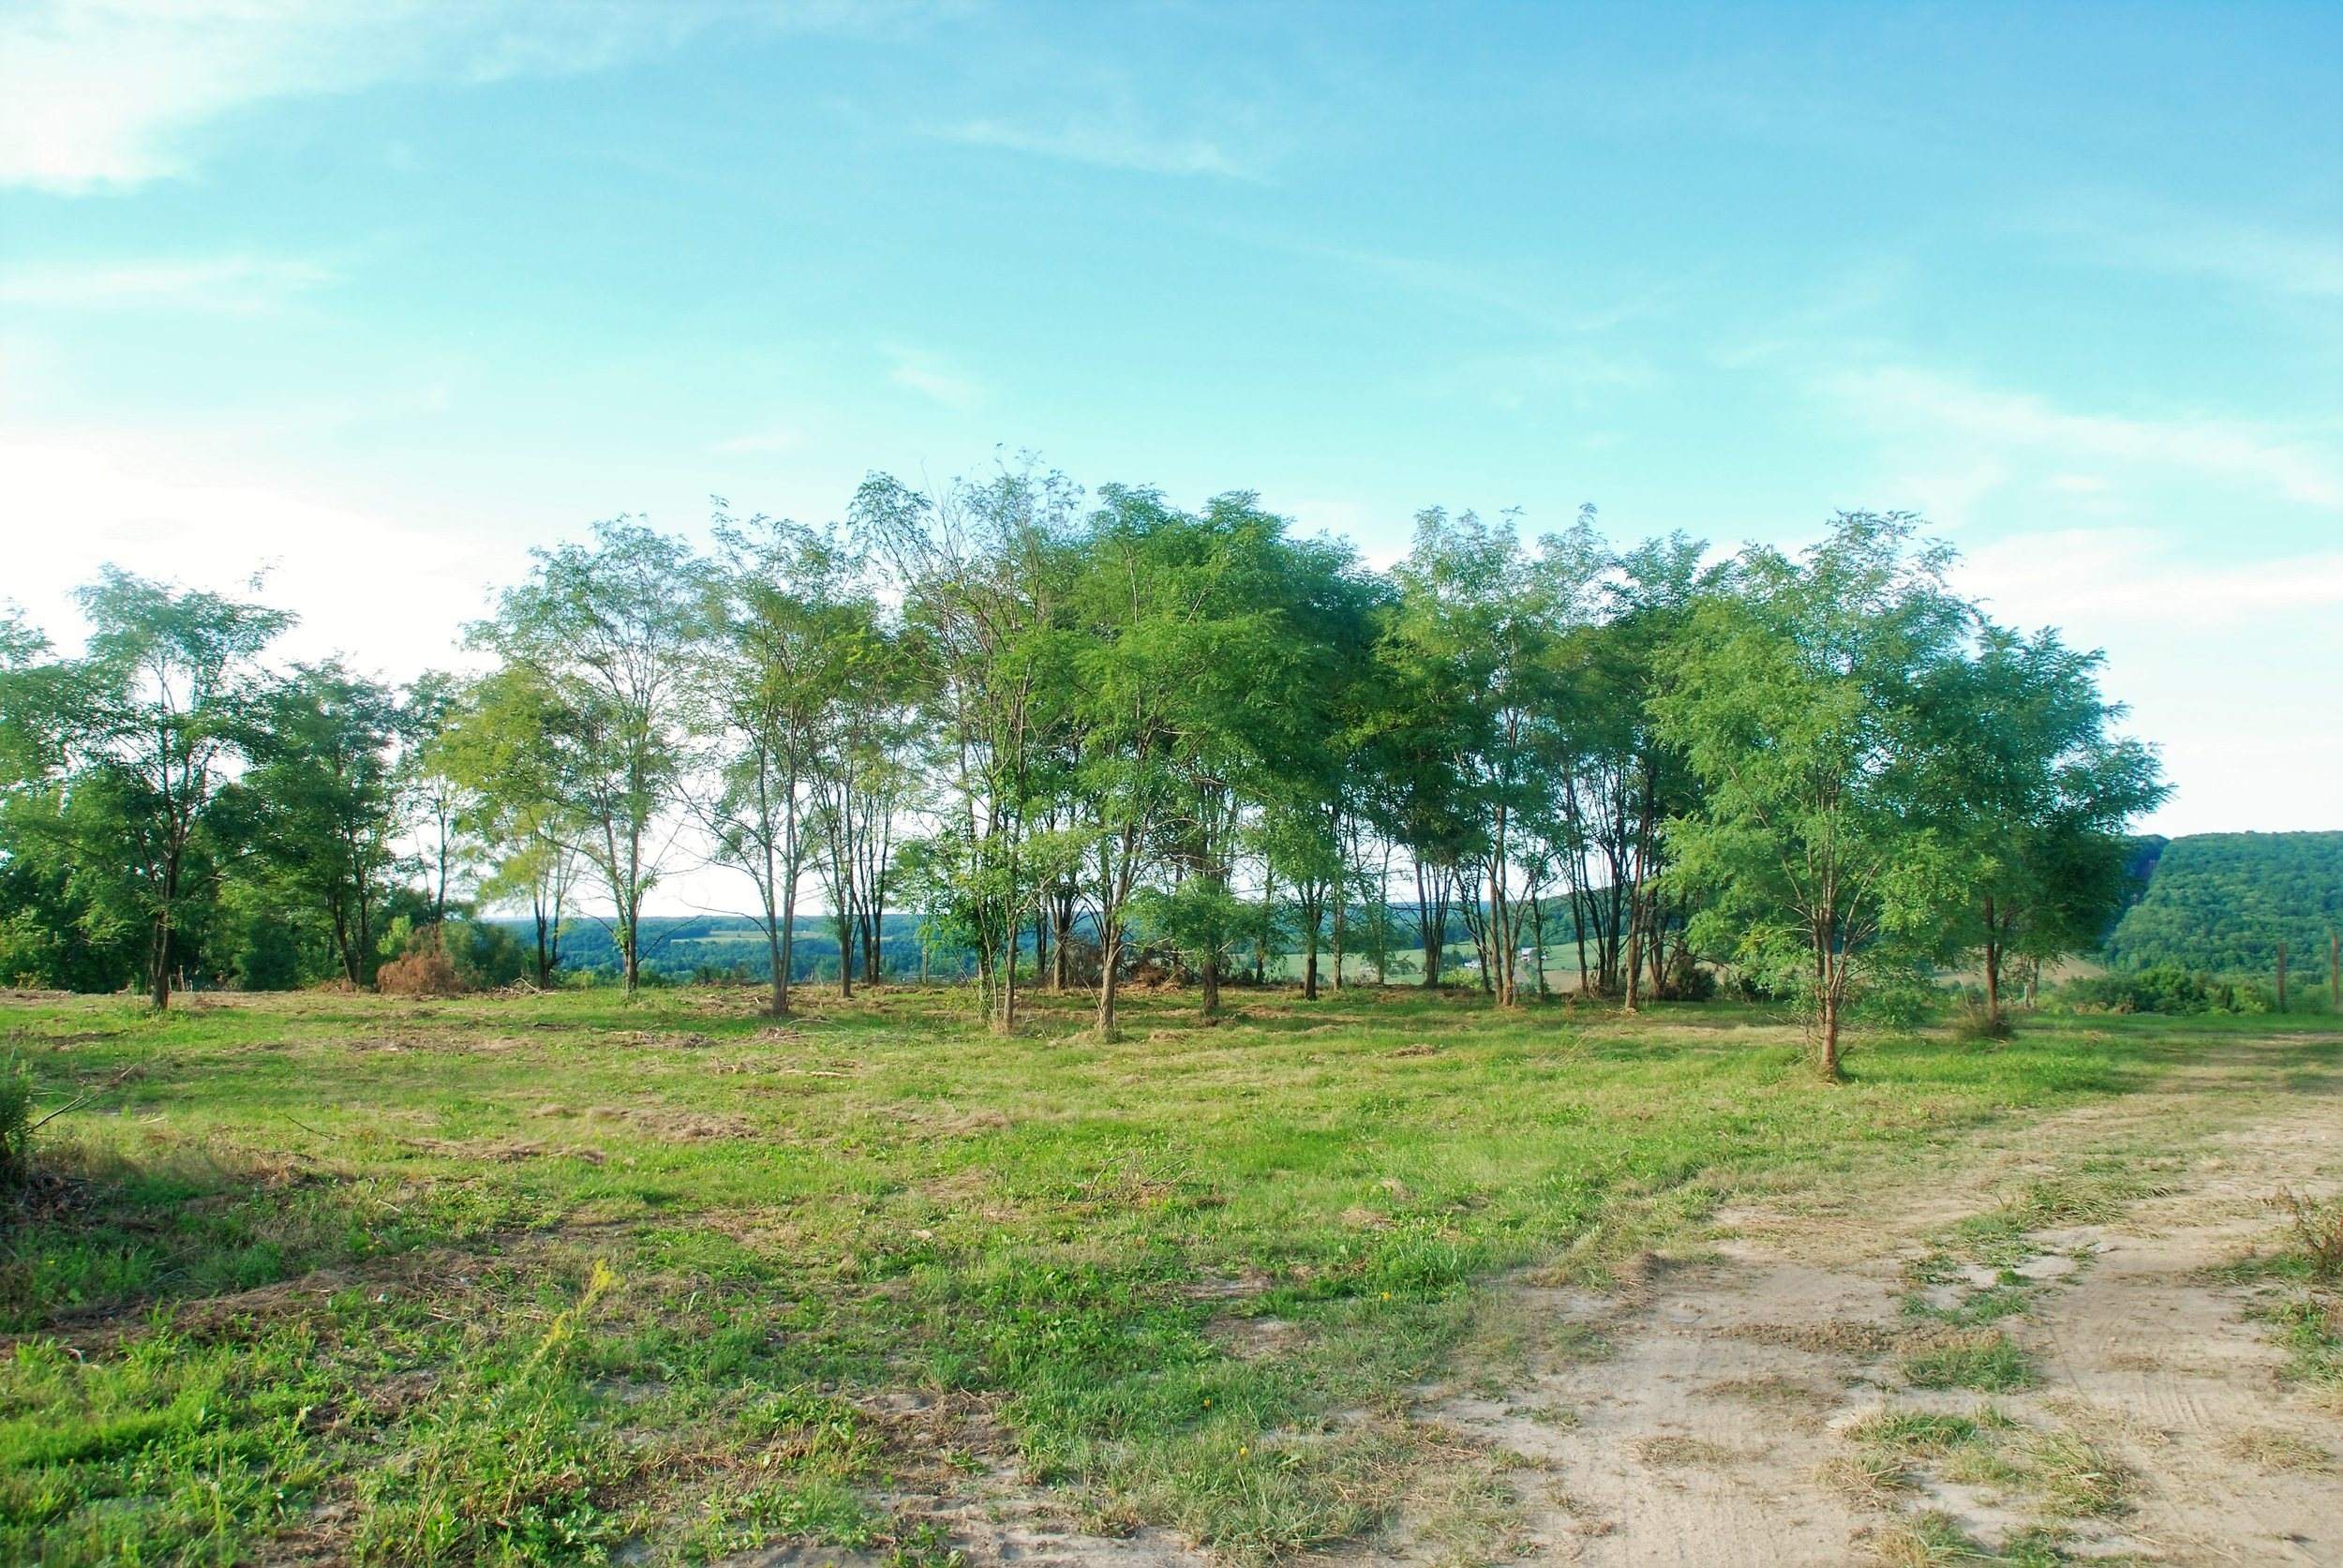 New Land 1.jpg